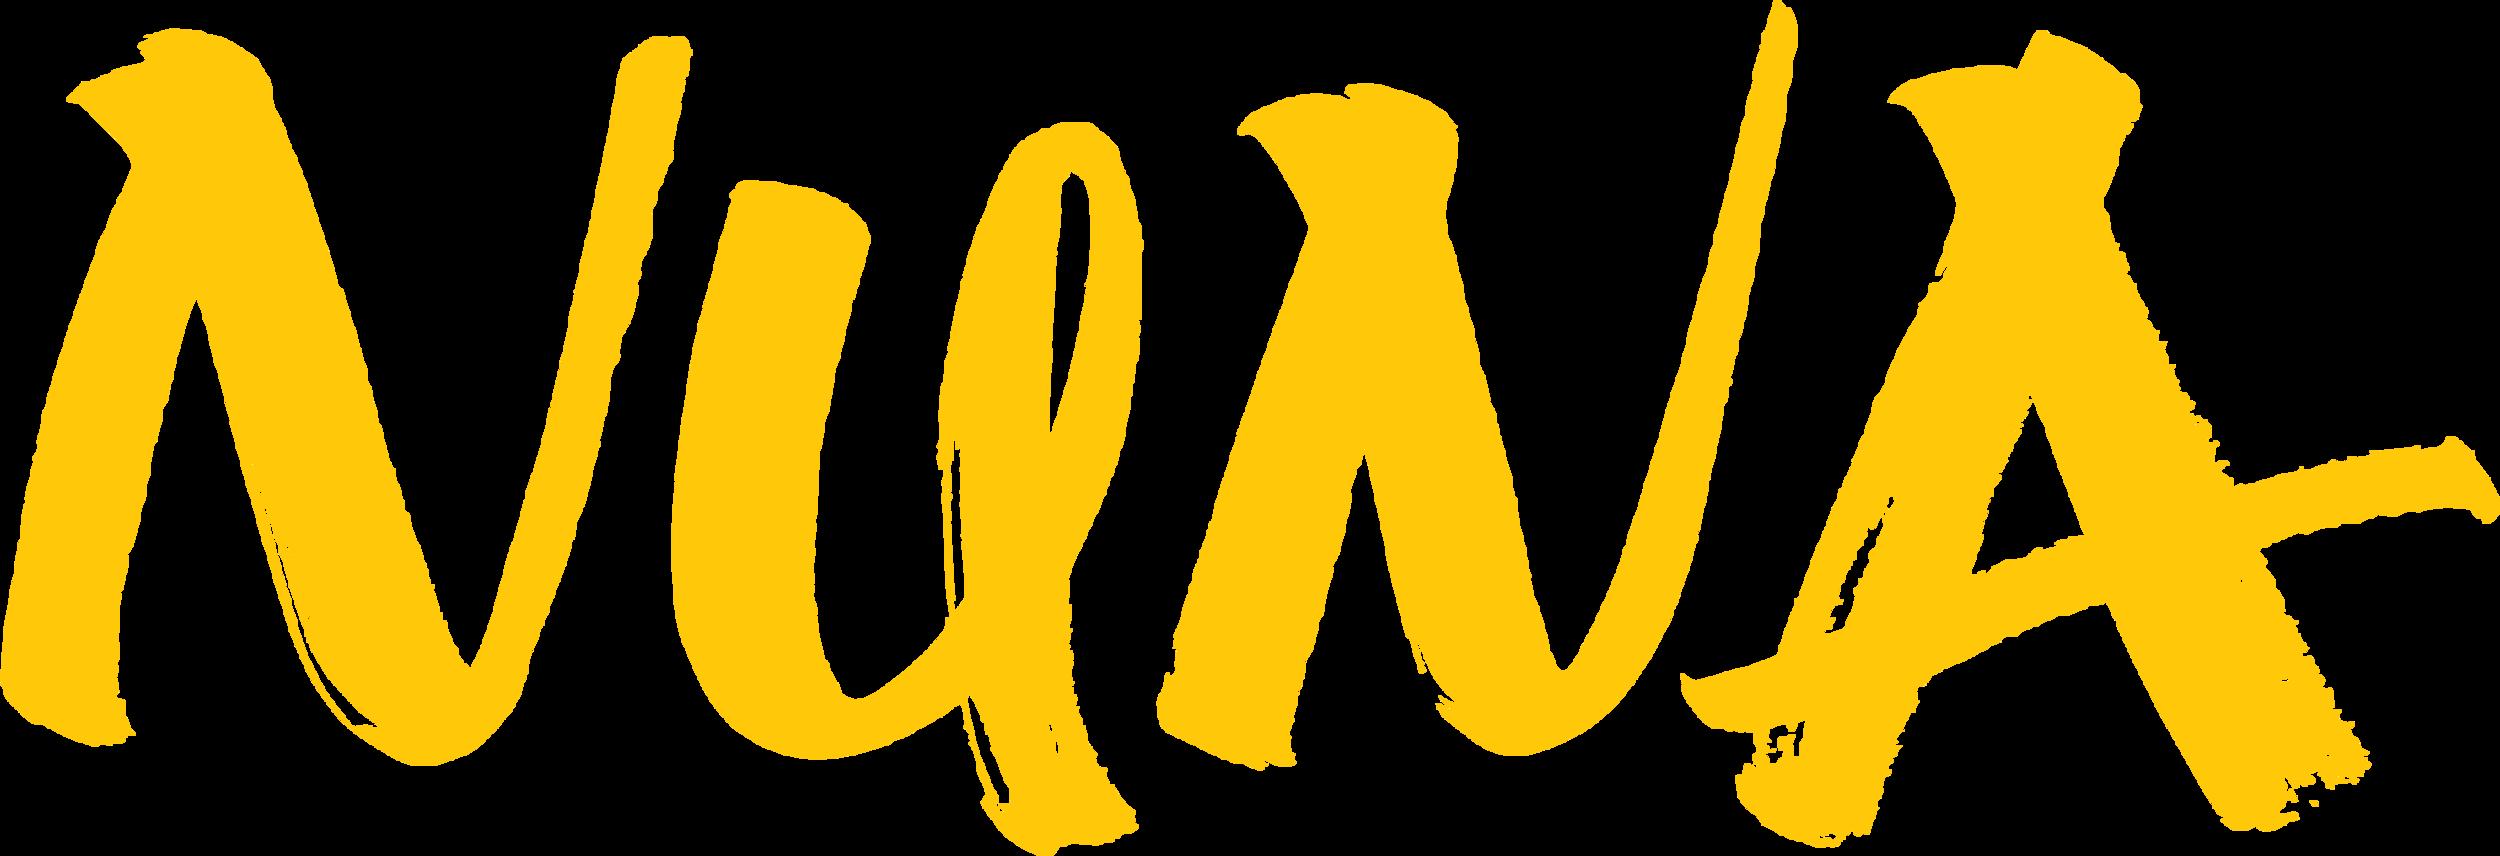 Logo_Nuna_Yellow_v1.png